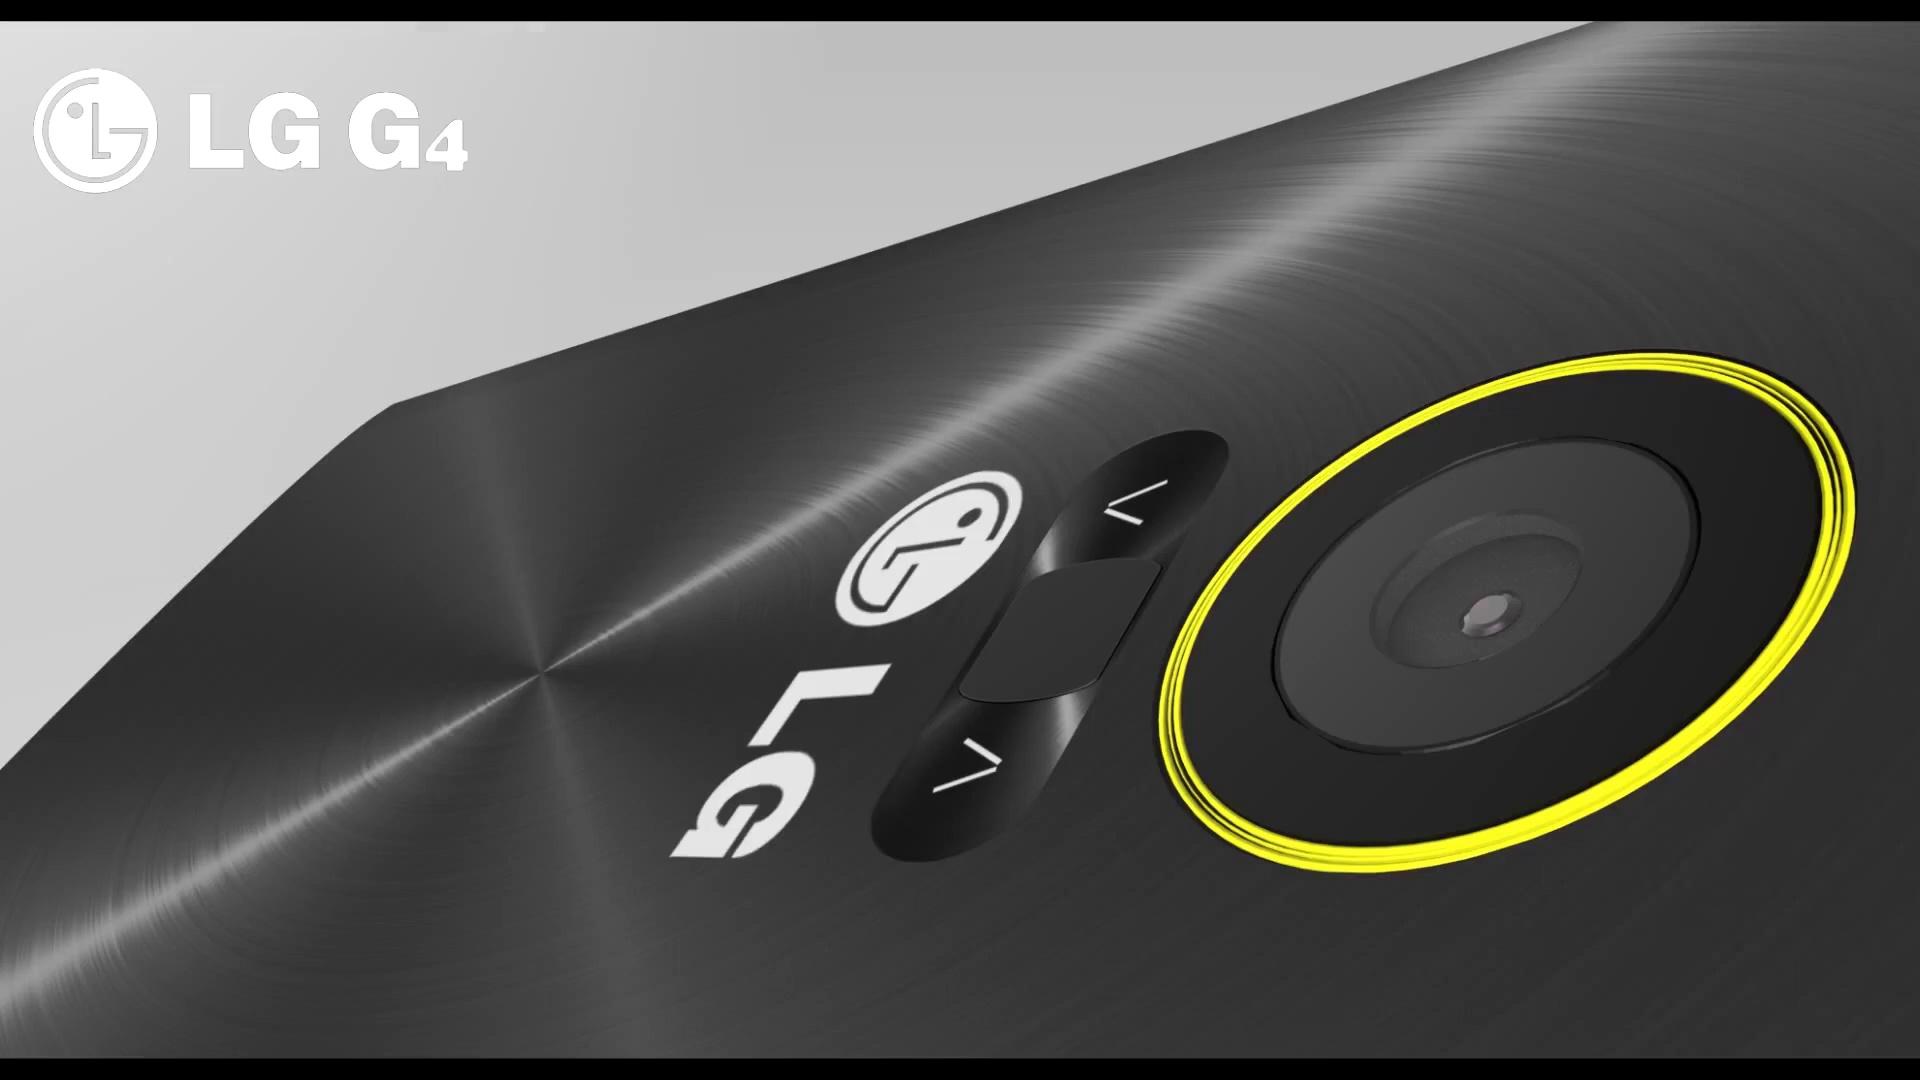 lg g4 snapdragon 810 stylet g-pen